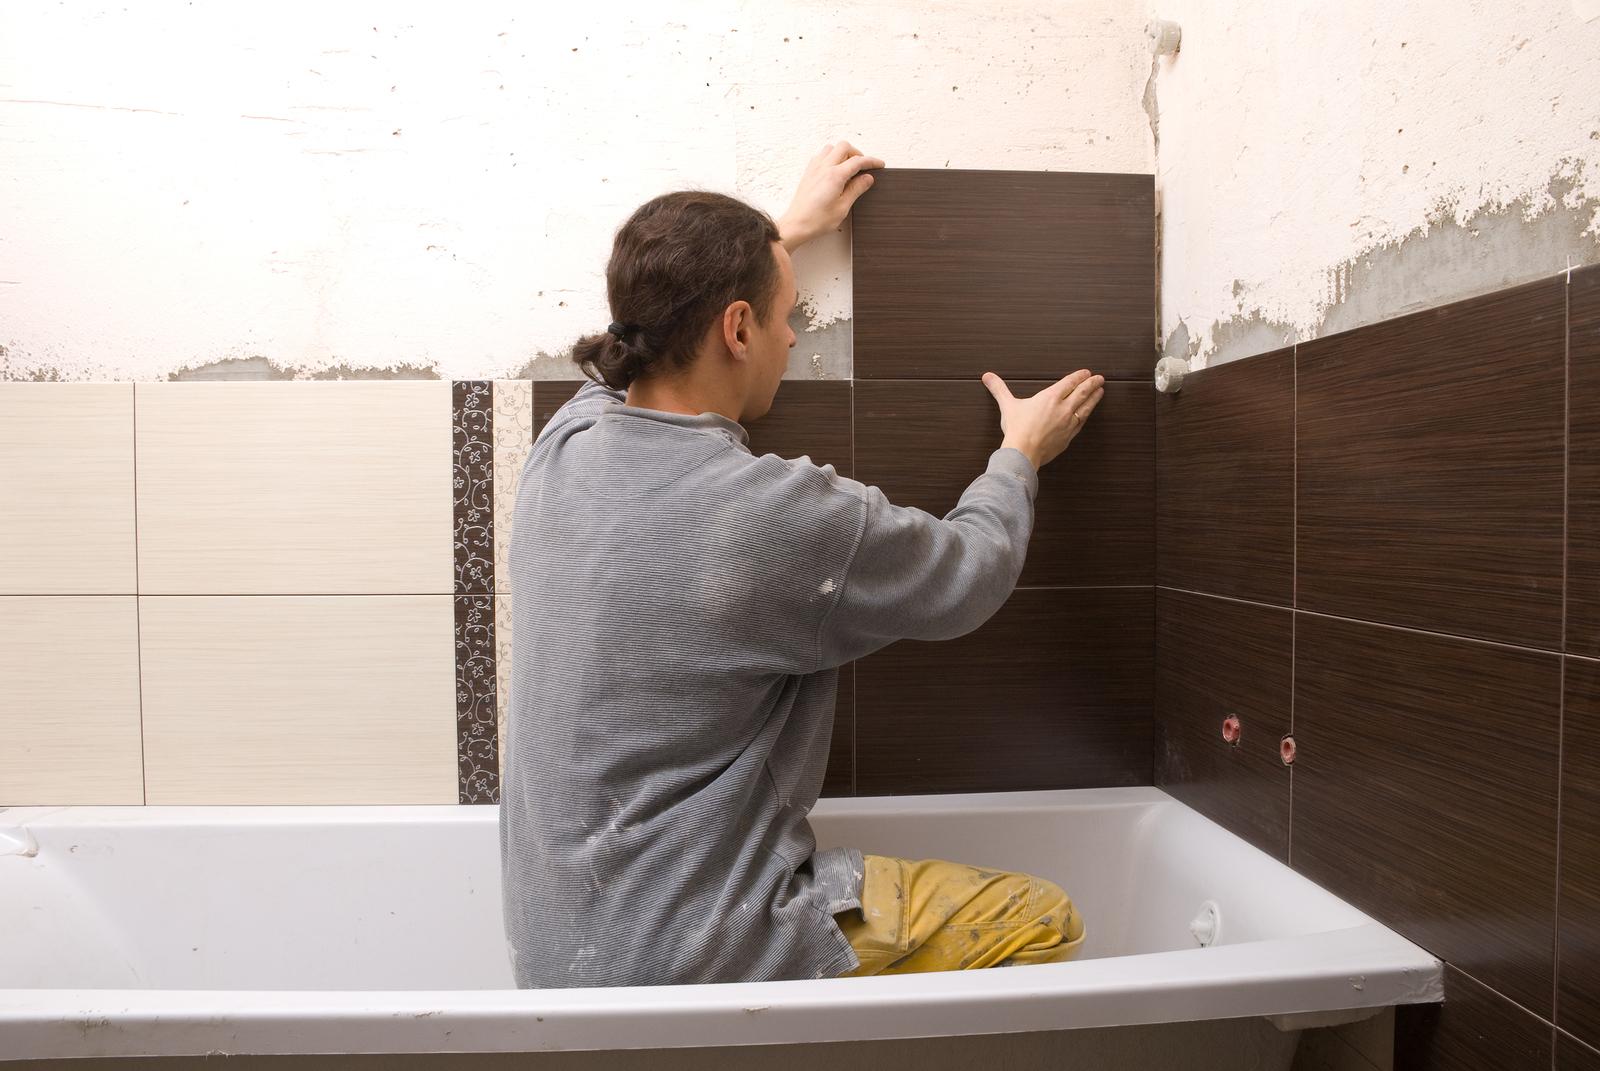 Timeline Of A Bathroom Renovation Project Landrys Painting Hesperia - Bathroom renovation timeline